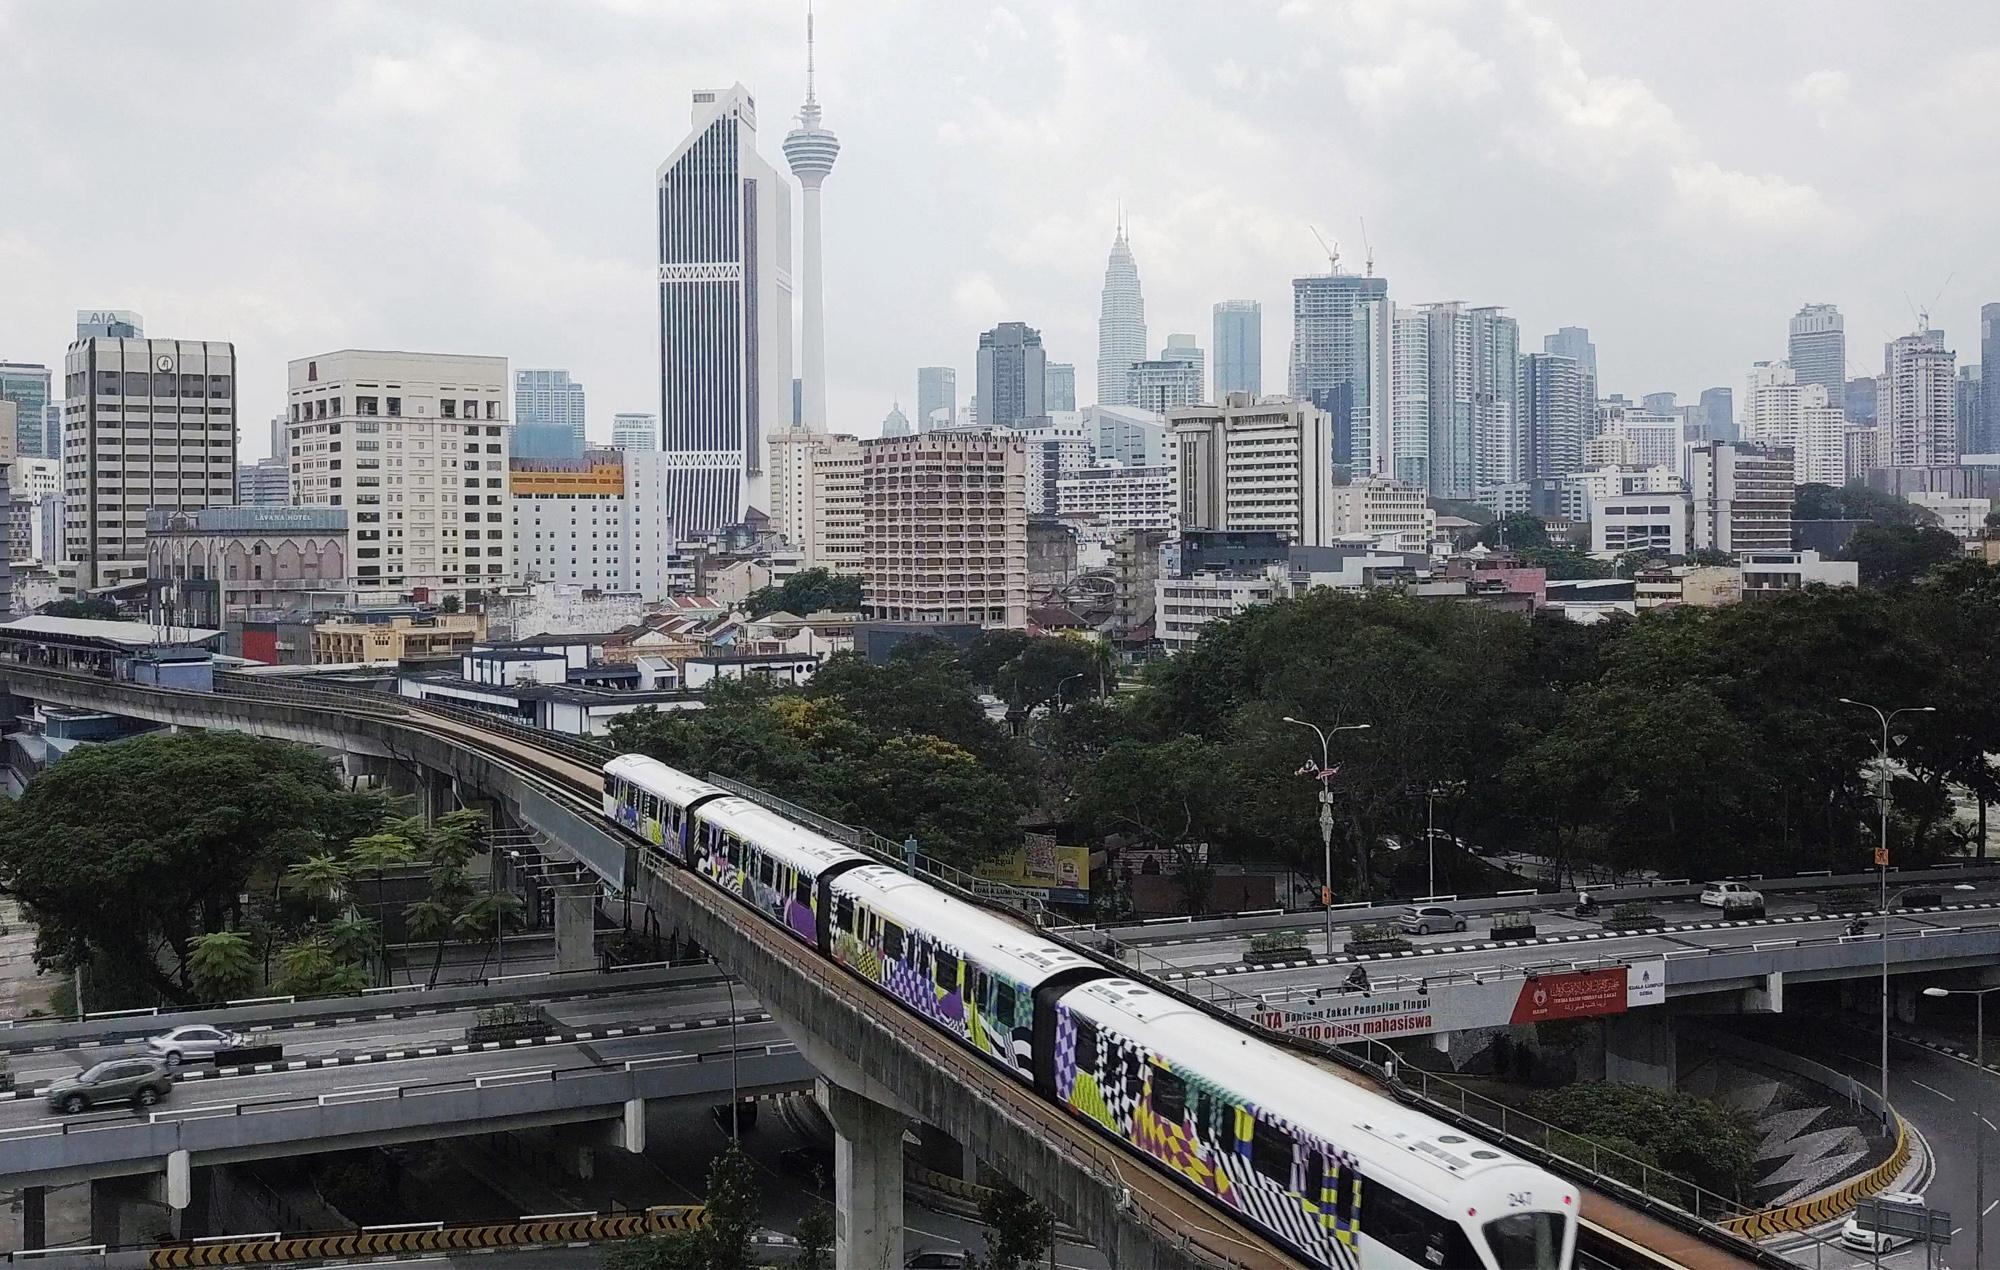 Vans Malaysia These Projects Are Ads For Creativity Bono Stellar art train Kuala Lumpur